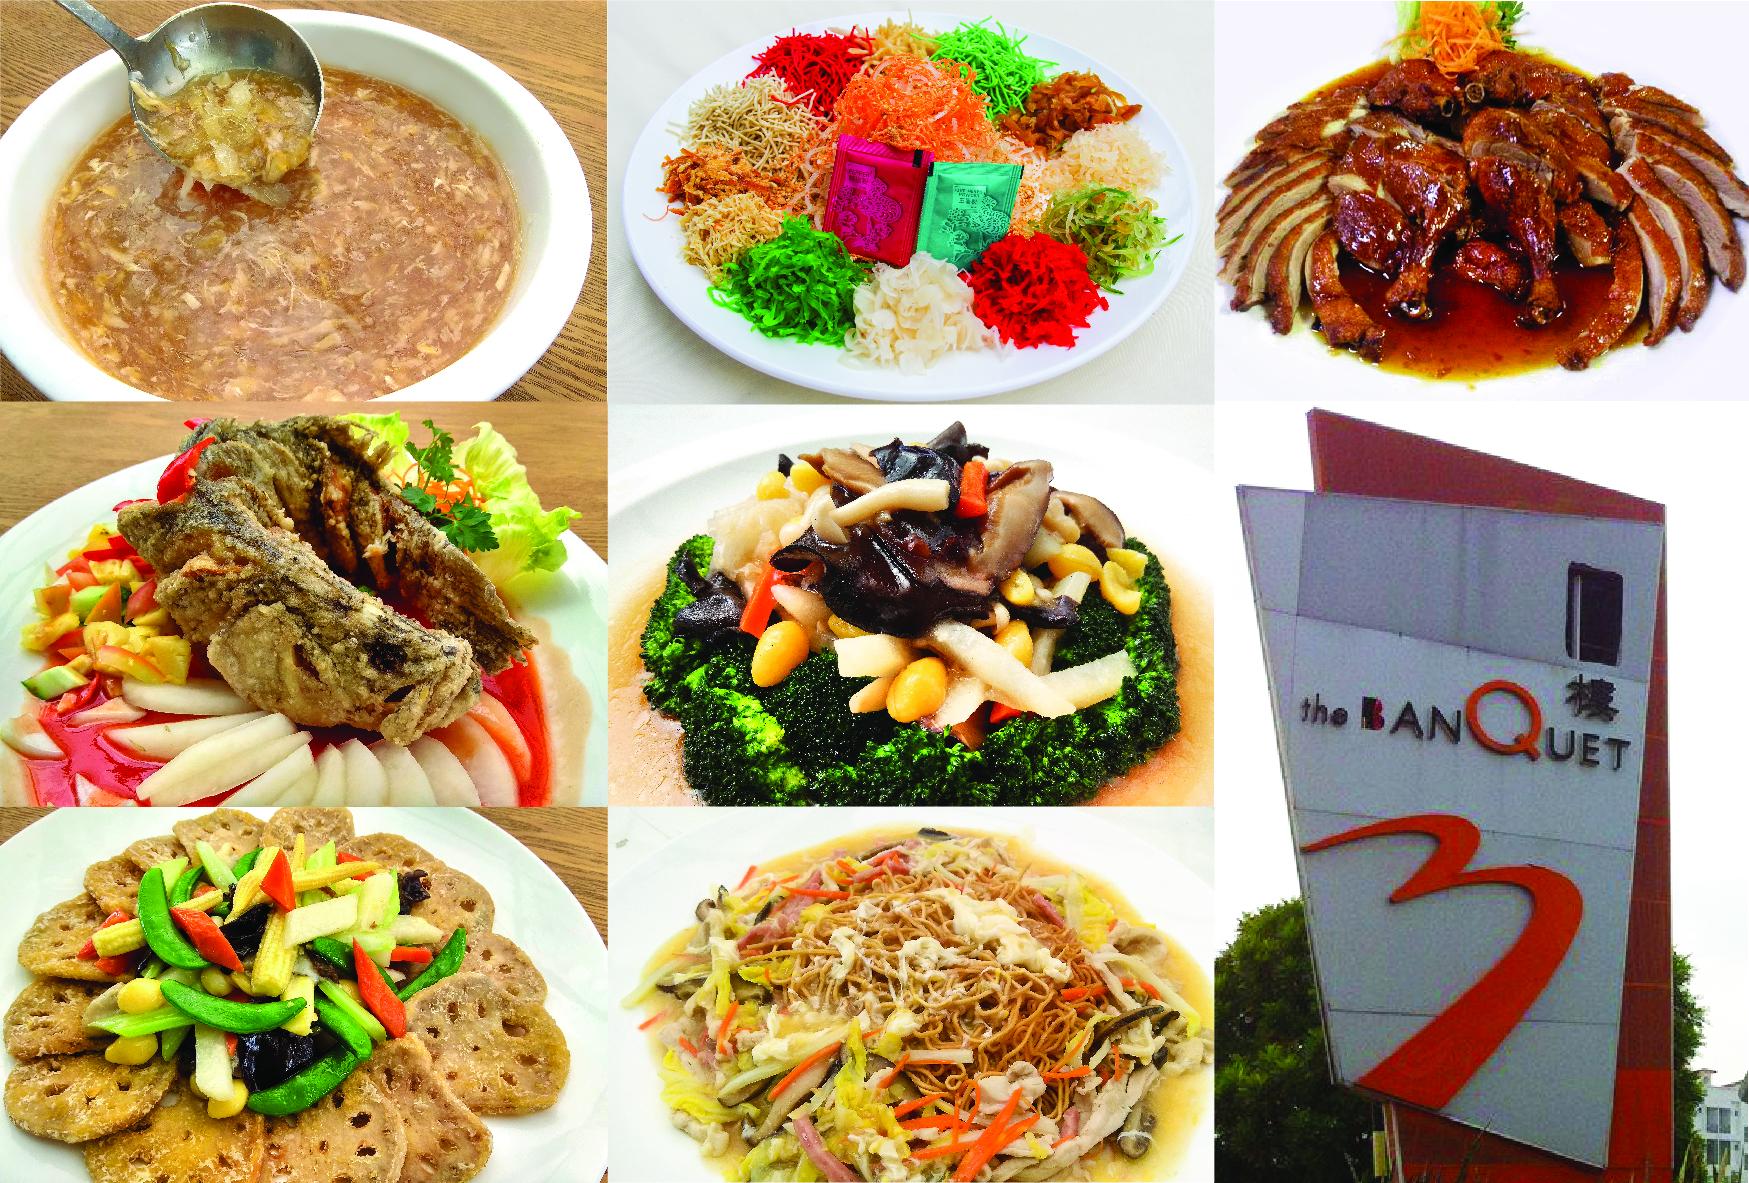 the banquet-03